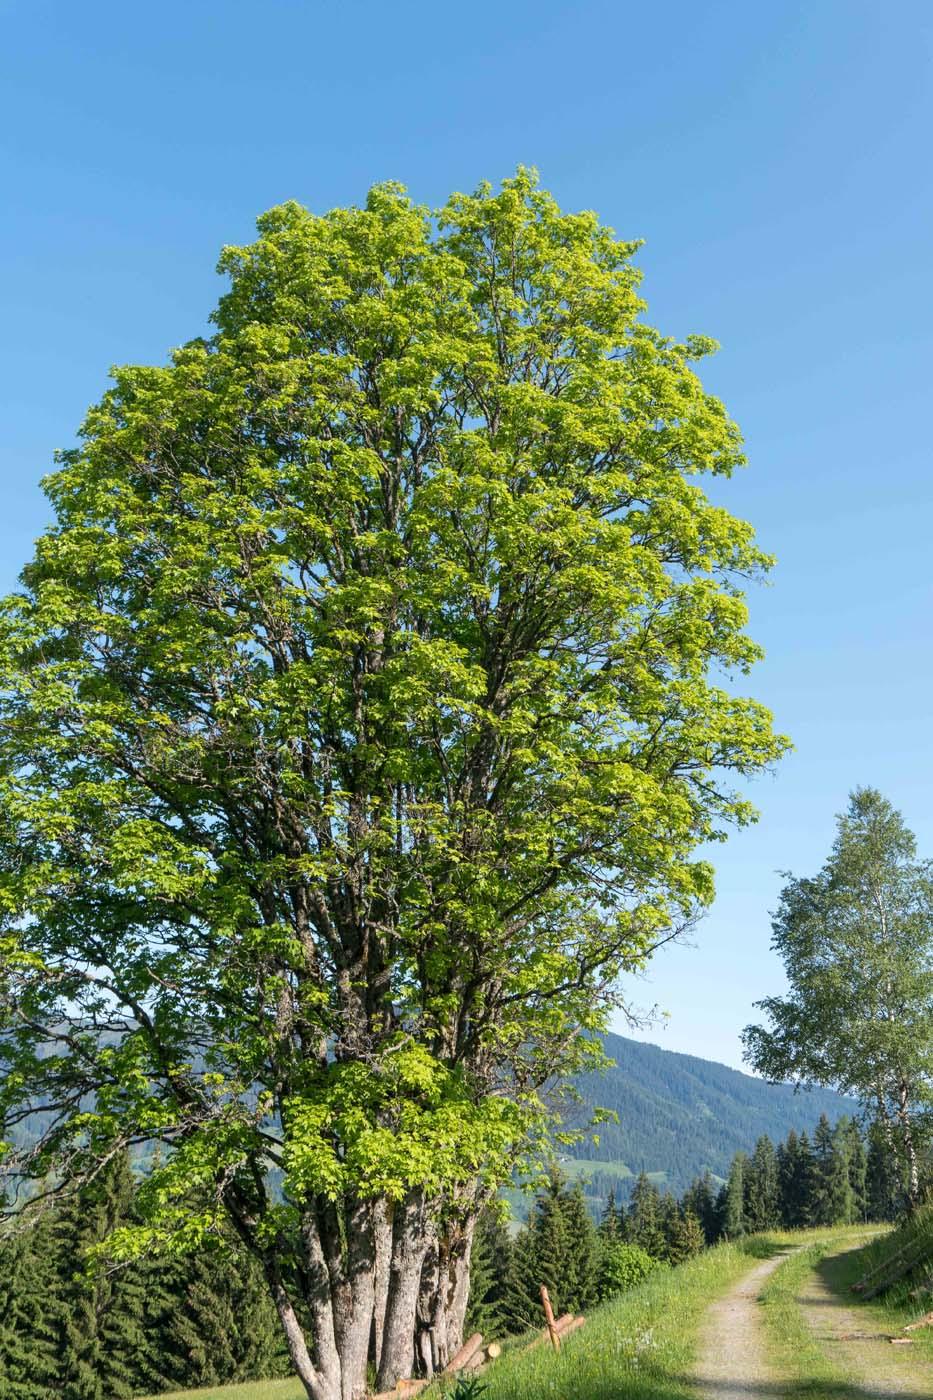 walk through the forest in Flachau